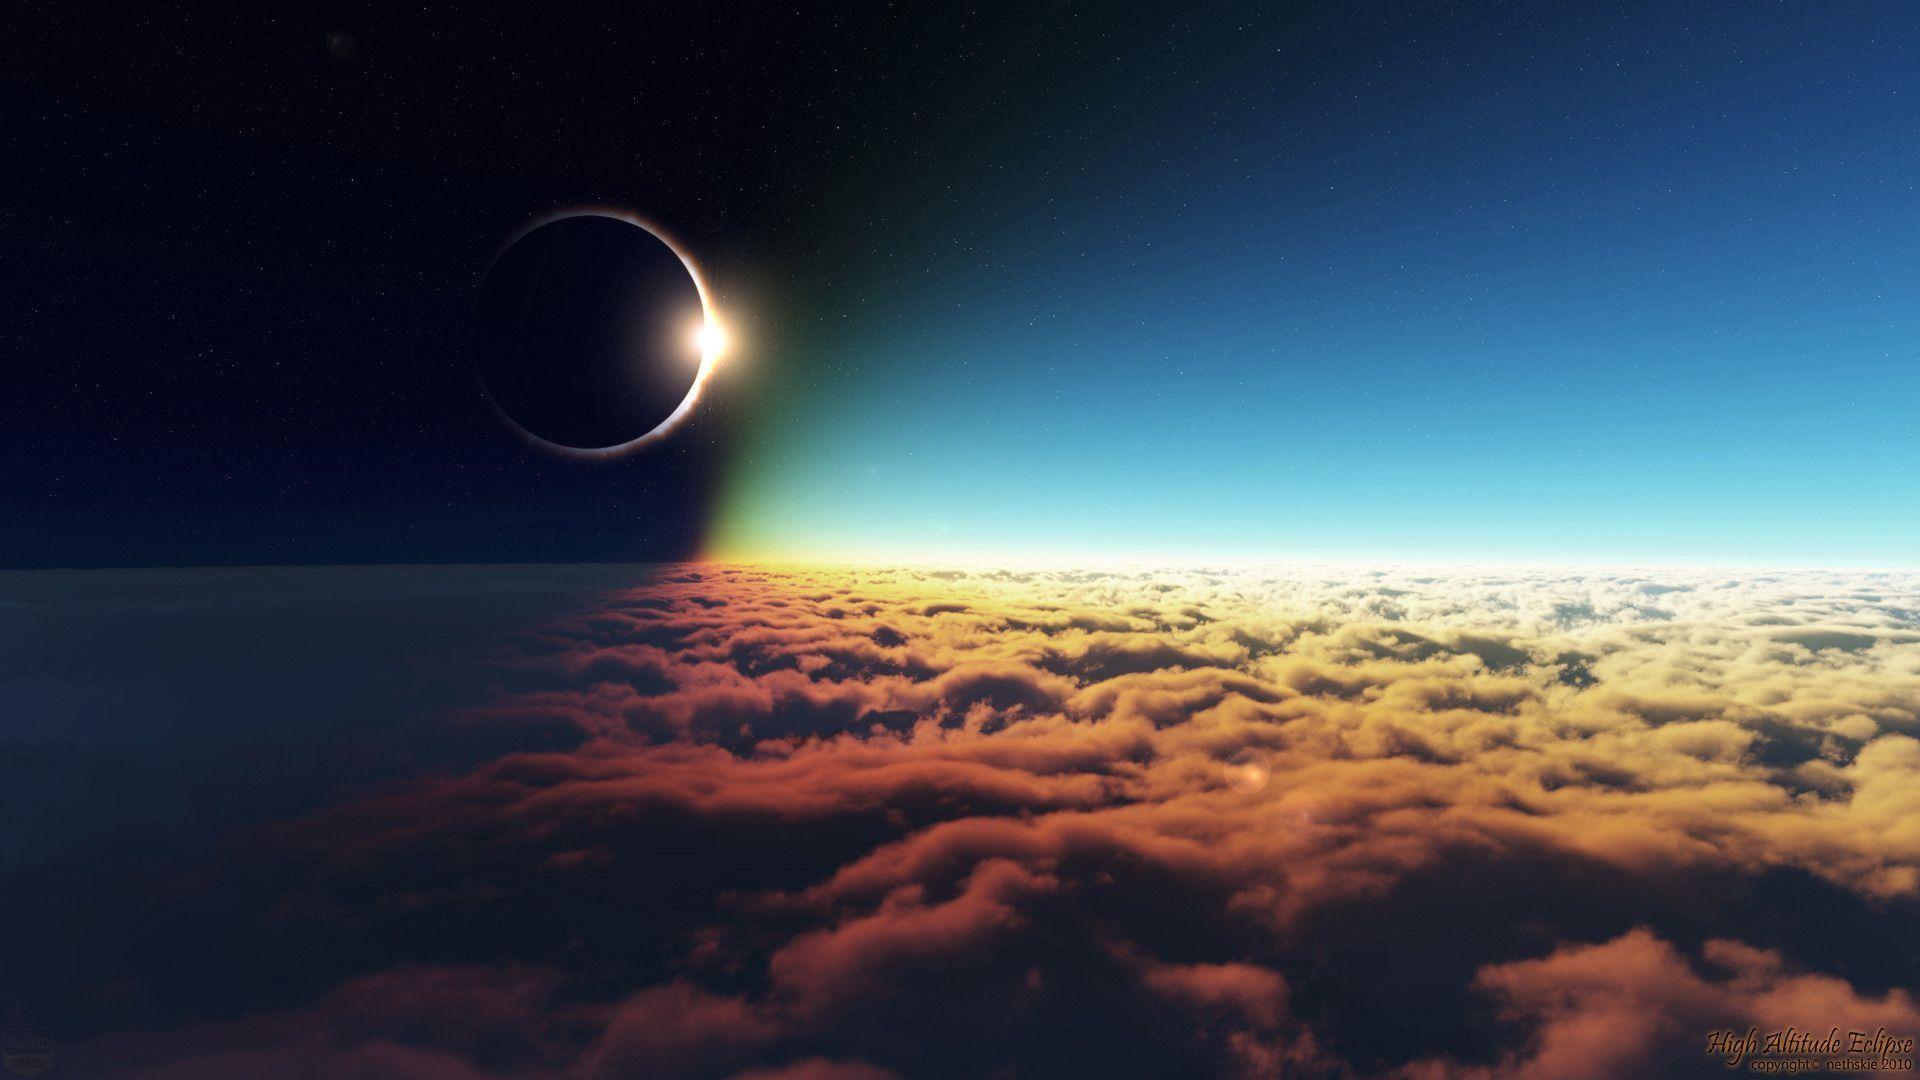 Sun And Moon Desktop Wallpaper 56 Images